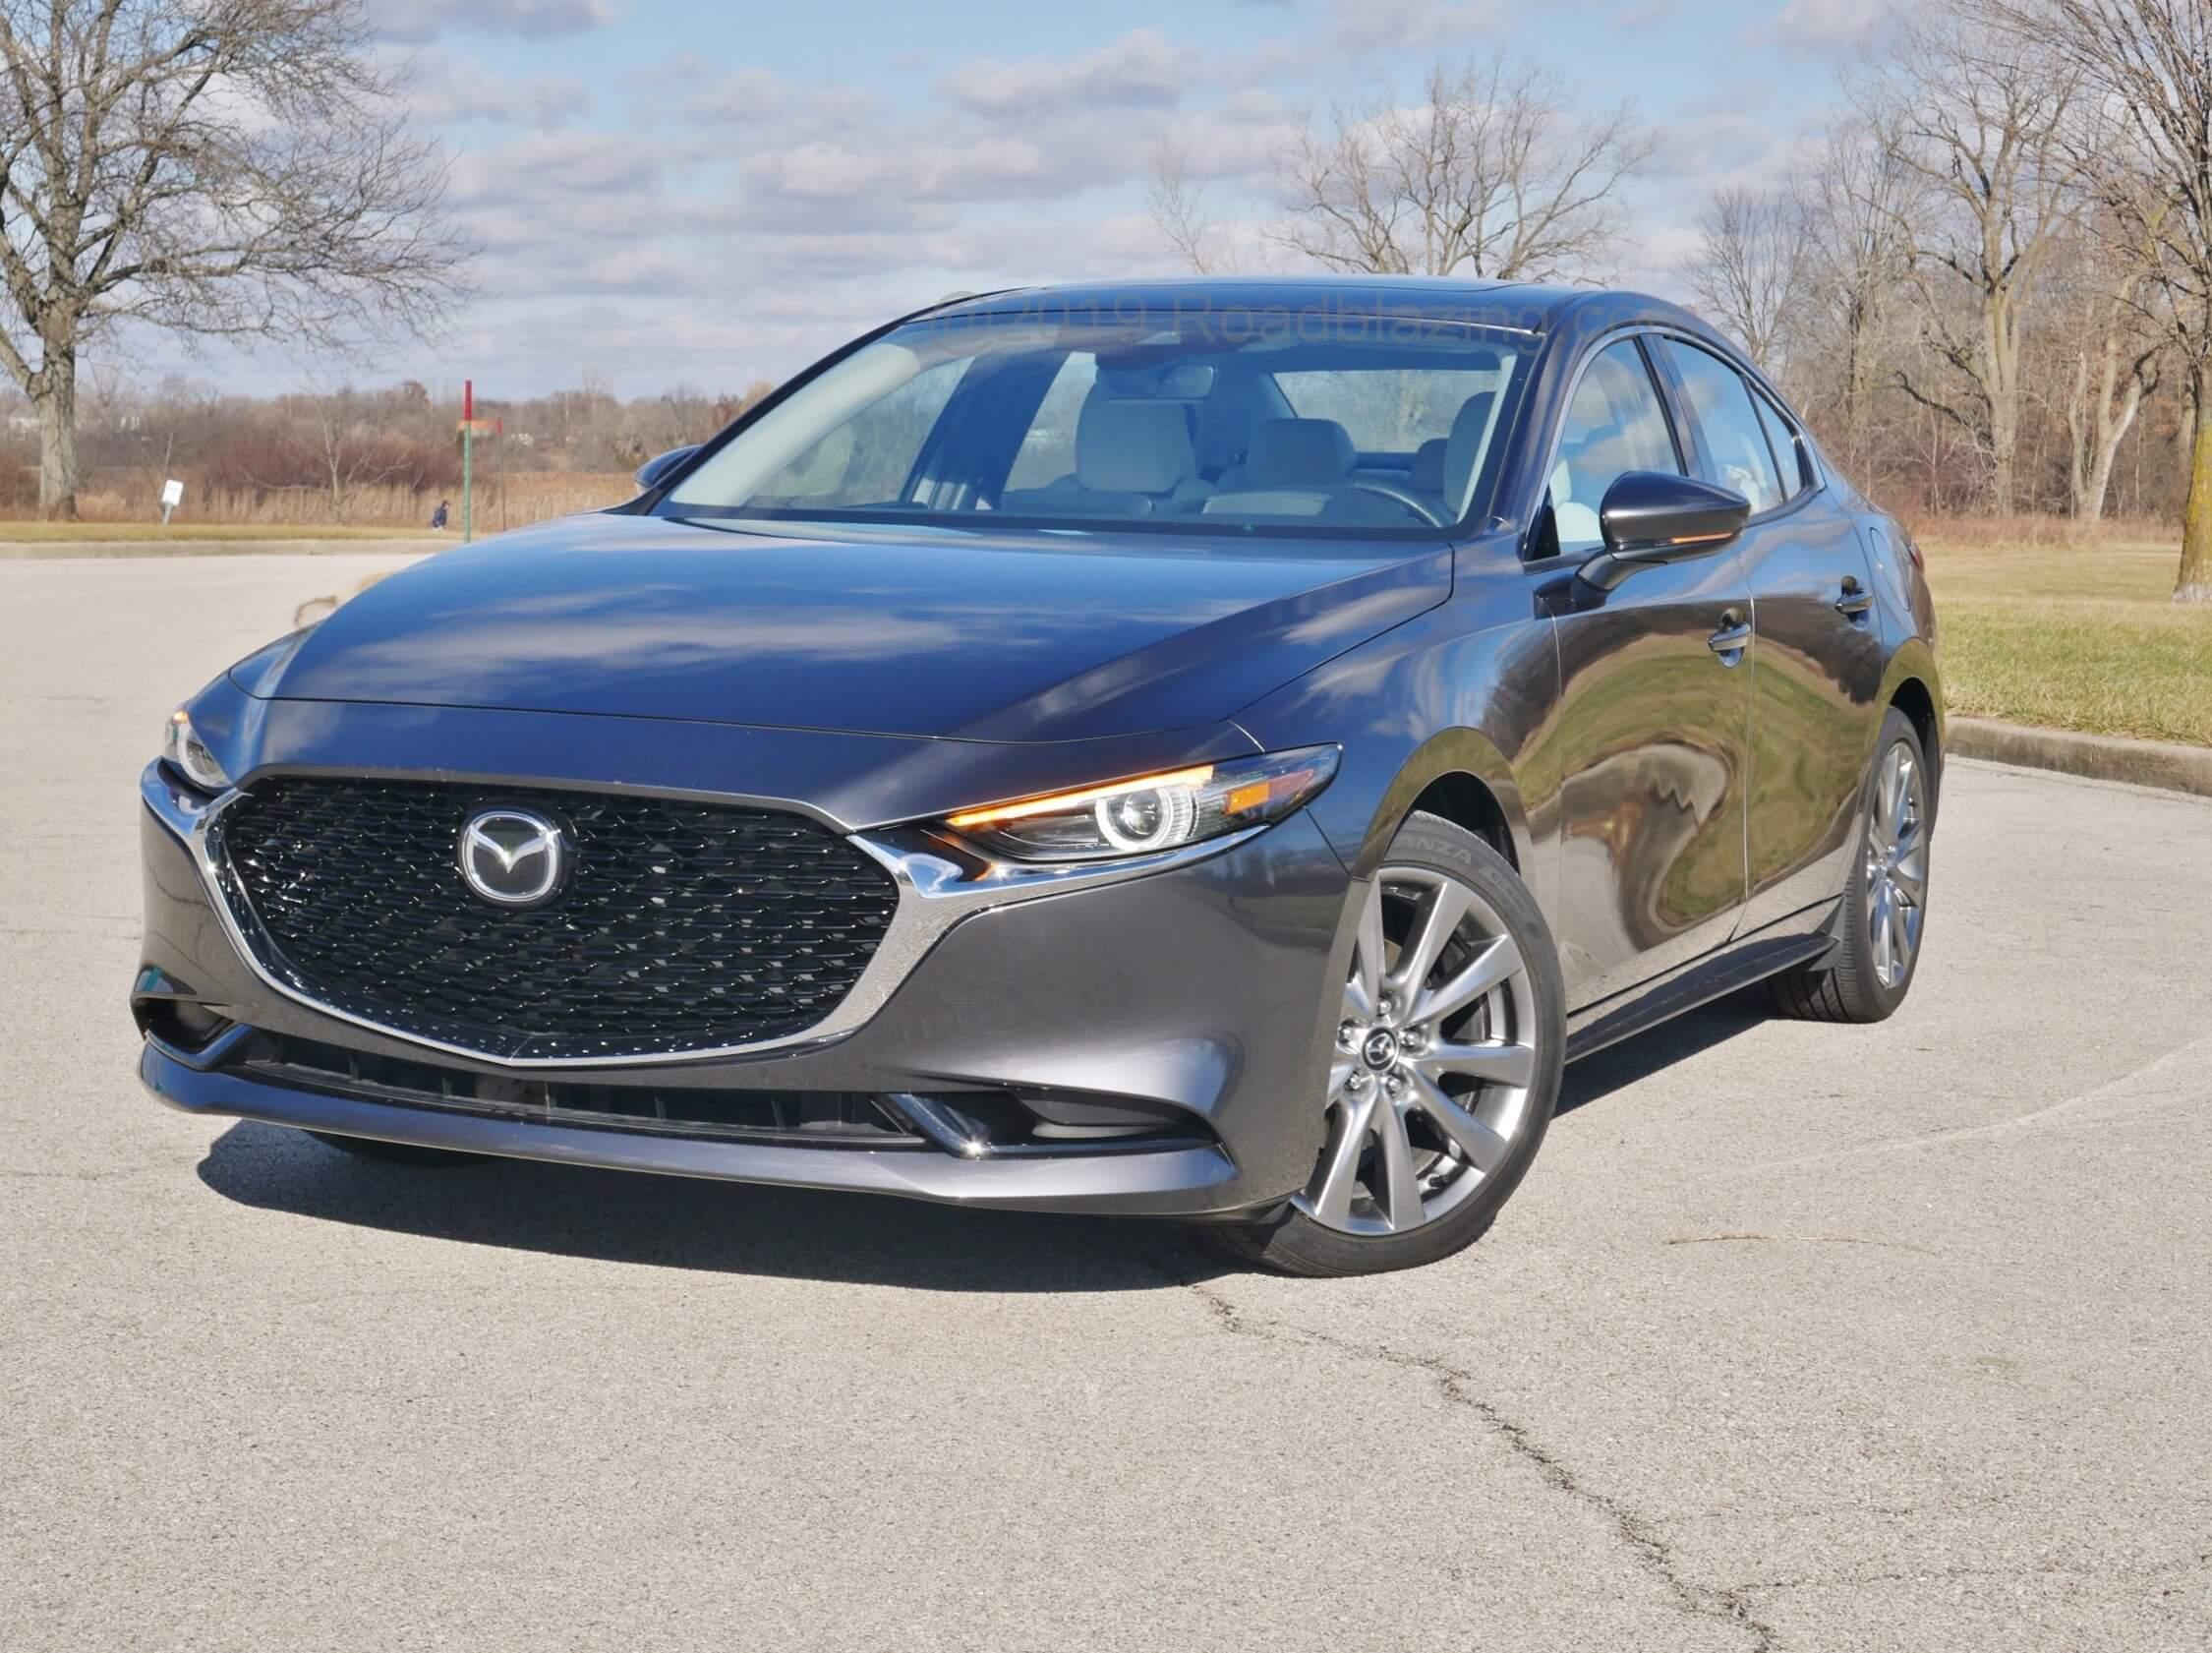 2020 Mazda 3 Sedan AWD - Bottom Line Review   RoadBlazing